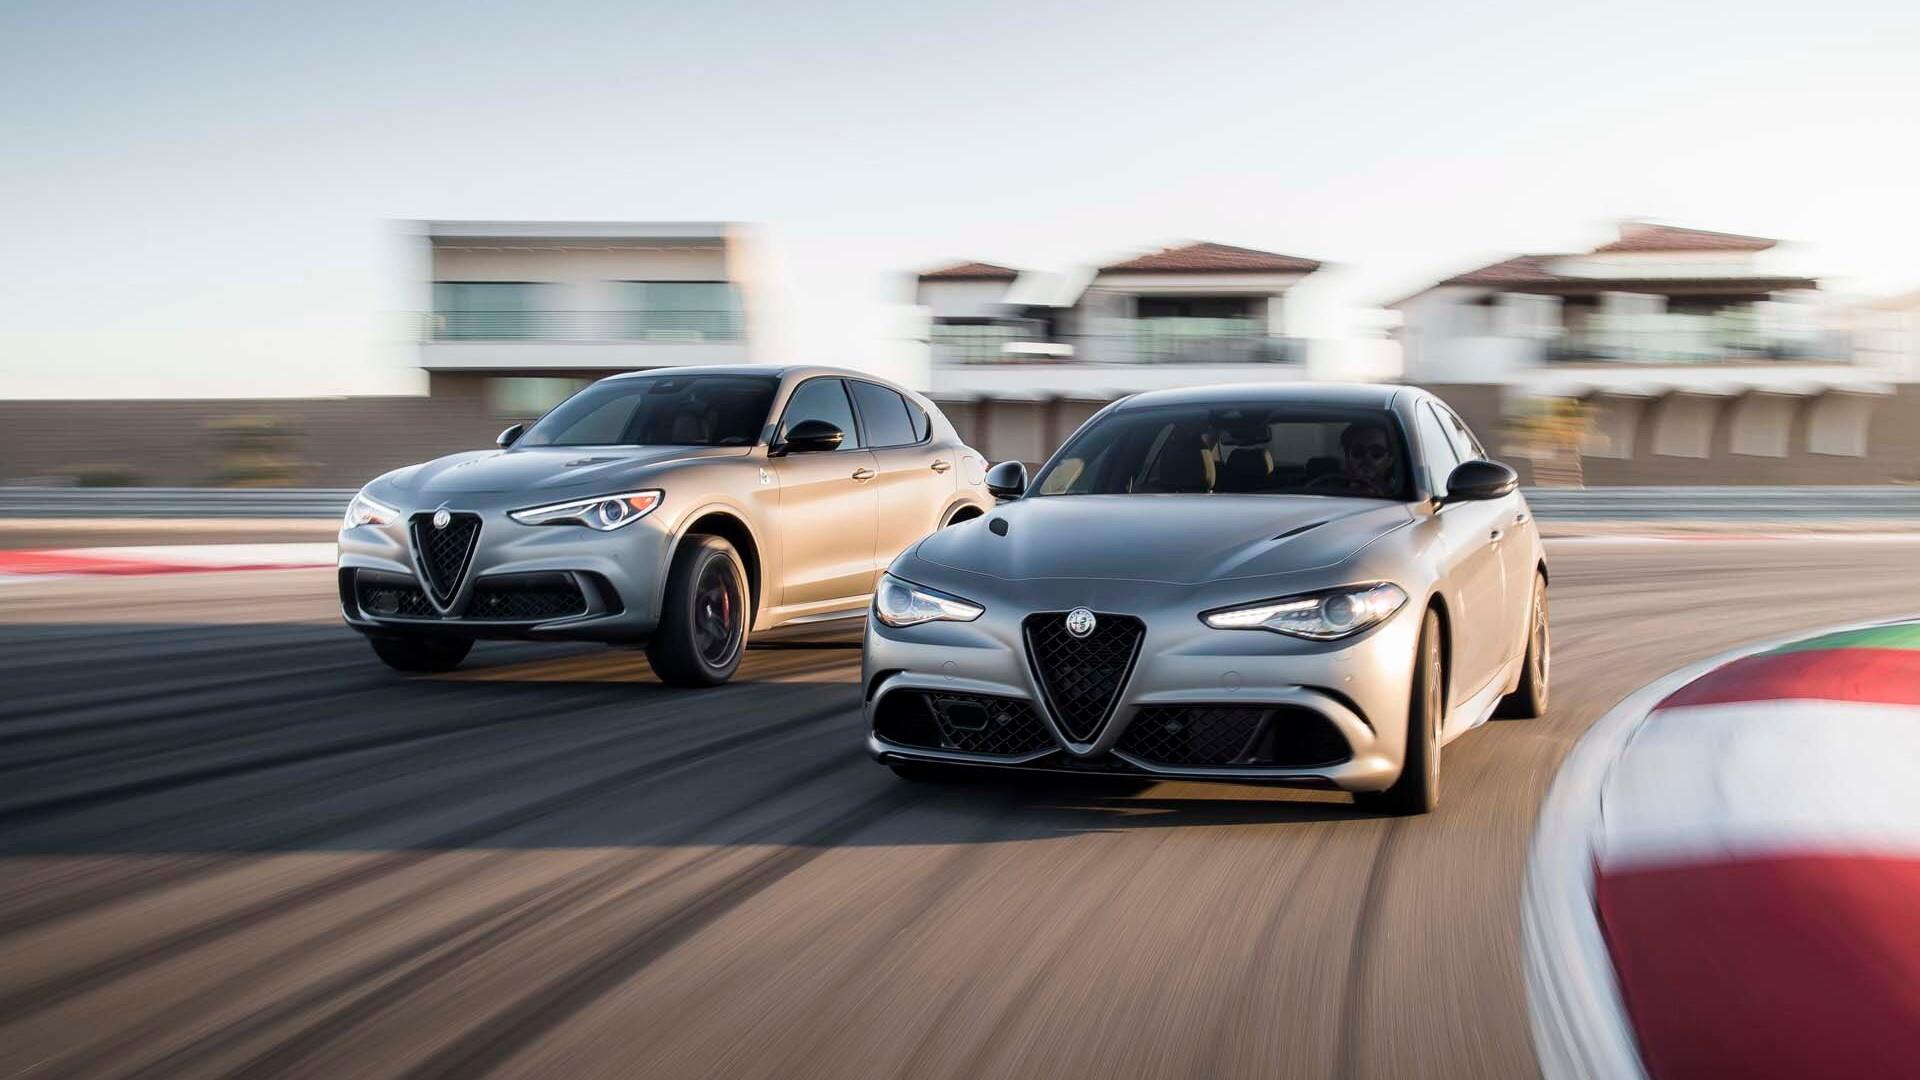 2019 Alfa Romeo Giulia and Stelvio Quadrifoglio NRING